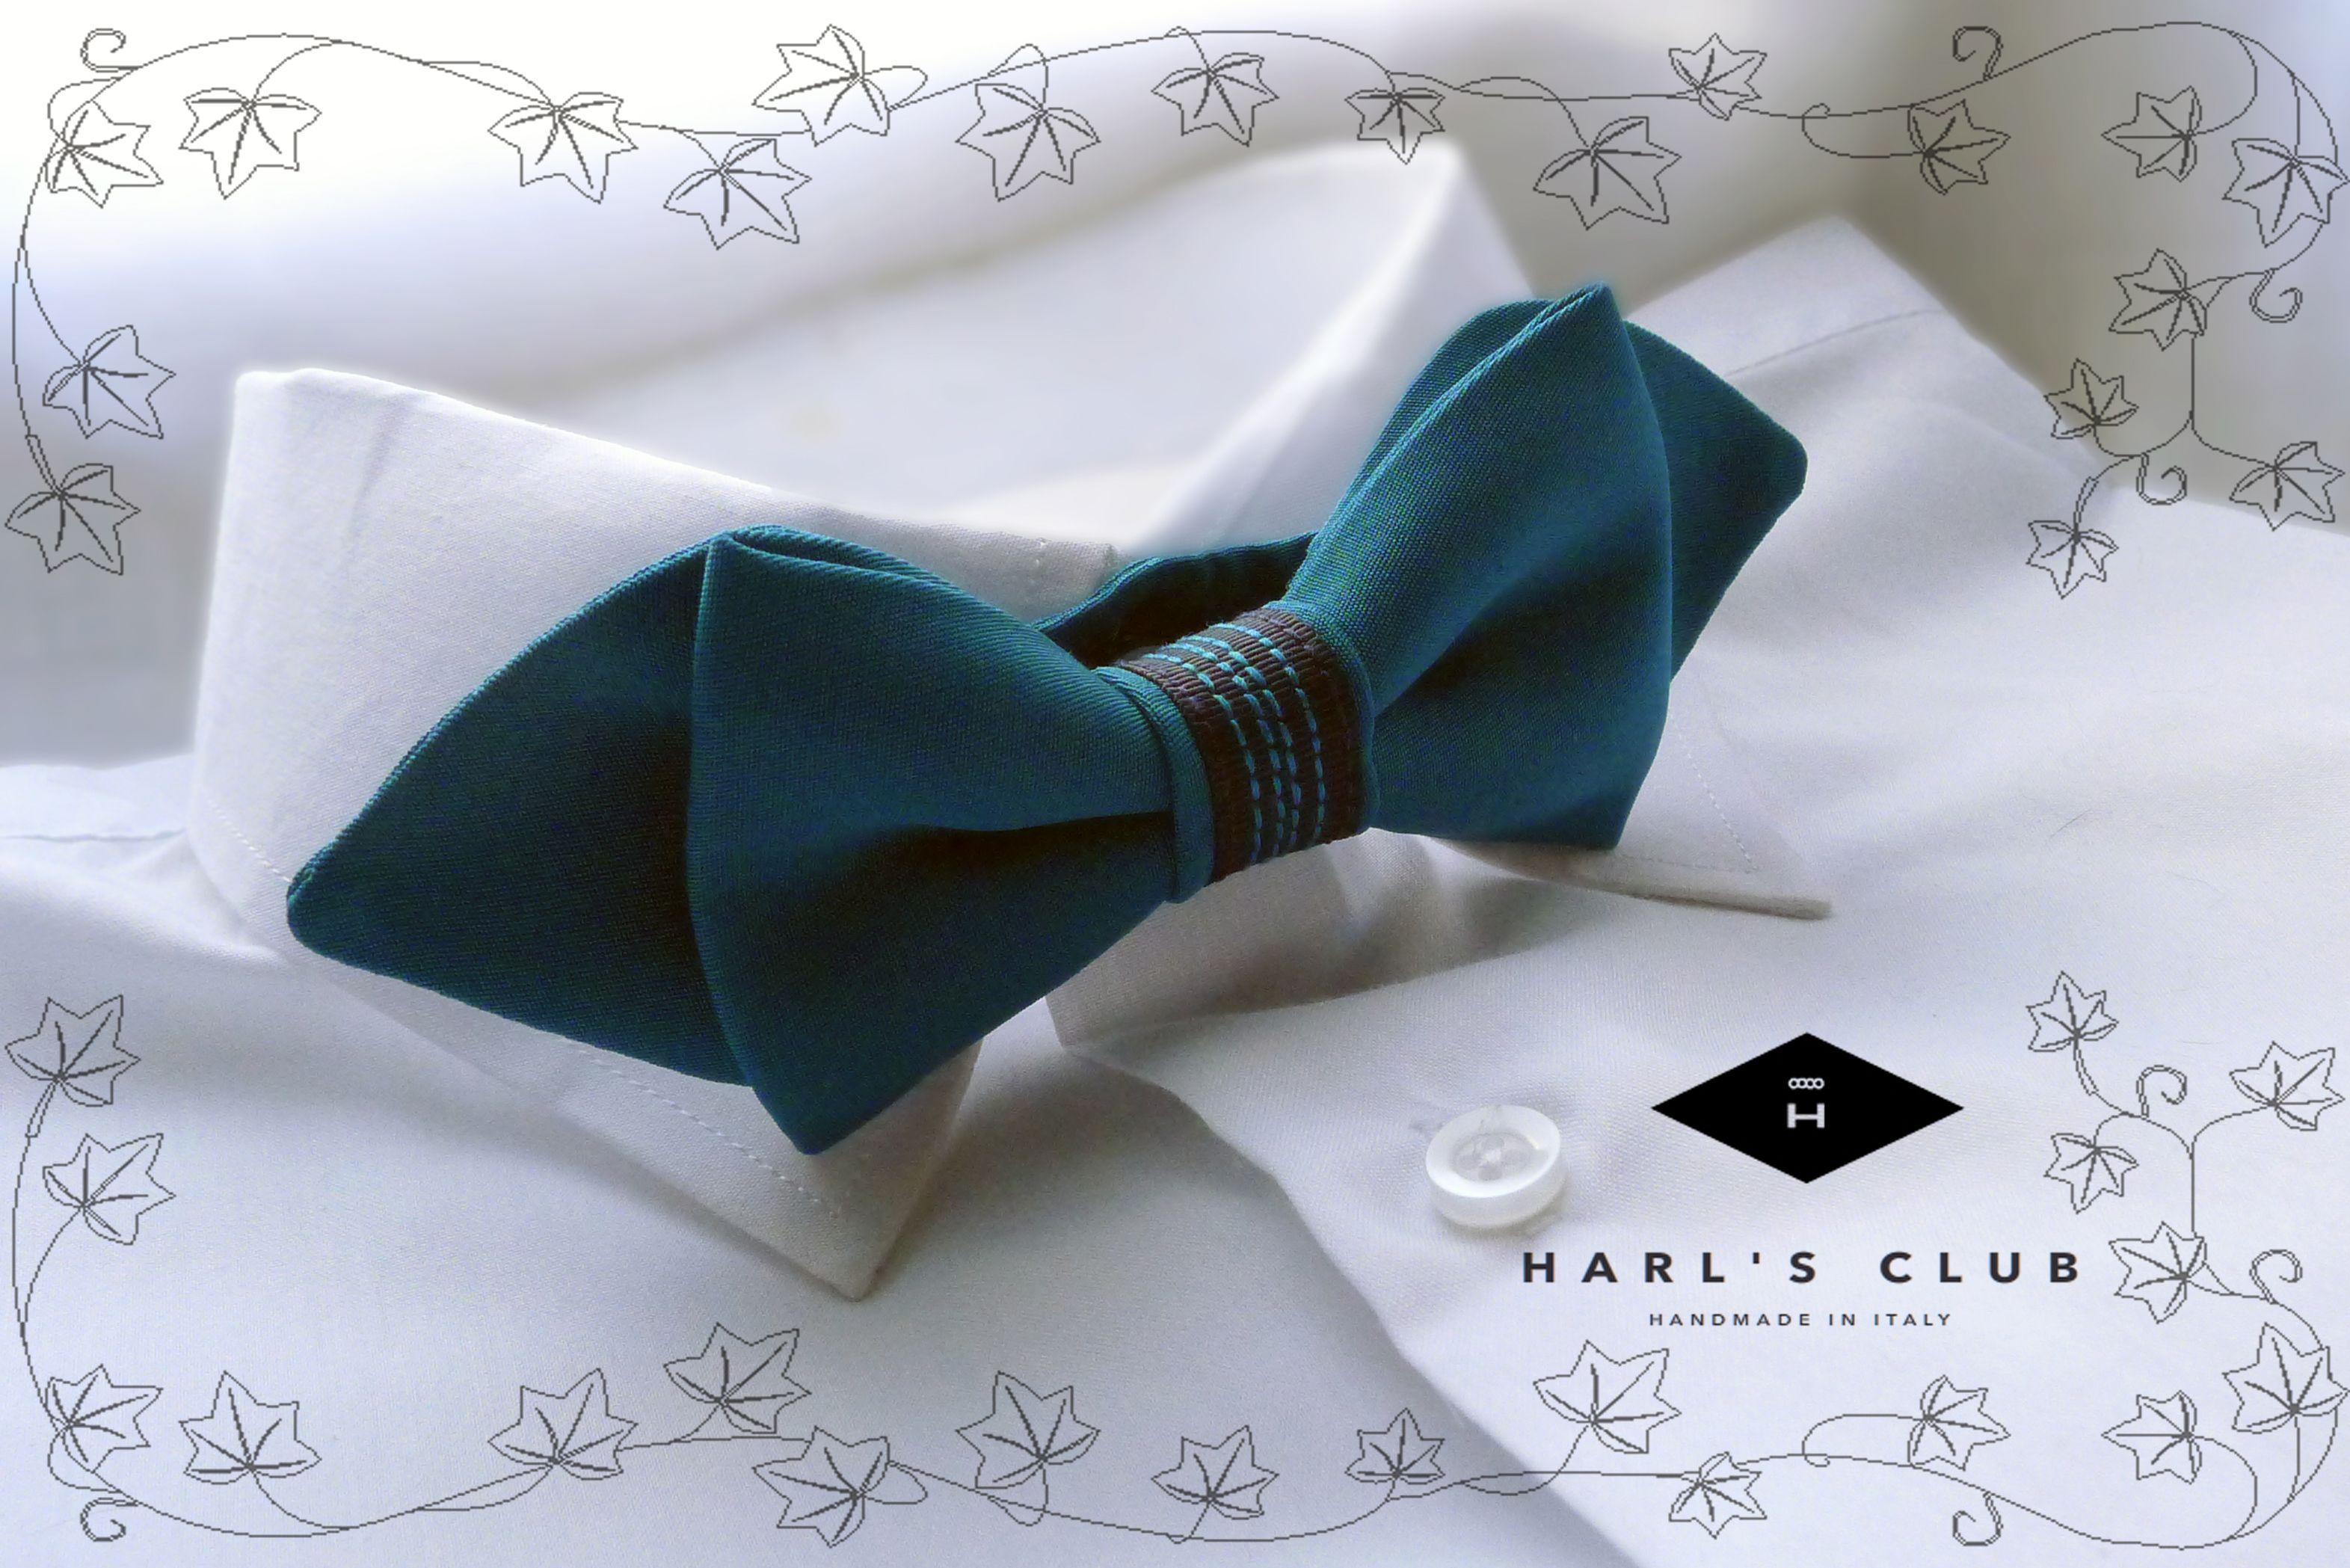 @HarlsClub #BowTies #PureSilk #handmade #Italianproduct #modauomo #modadonna #sartorial #design #fashion #glam #Instagram